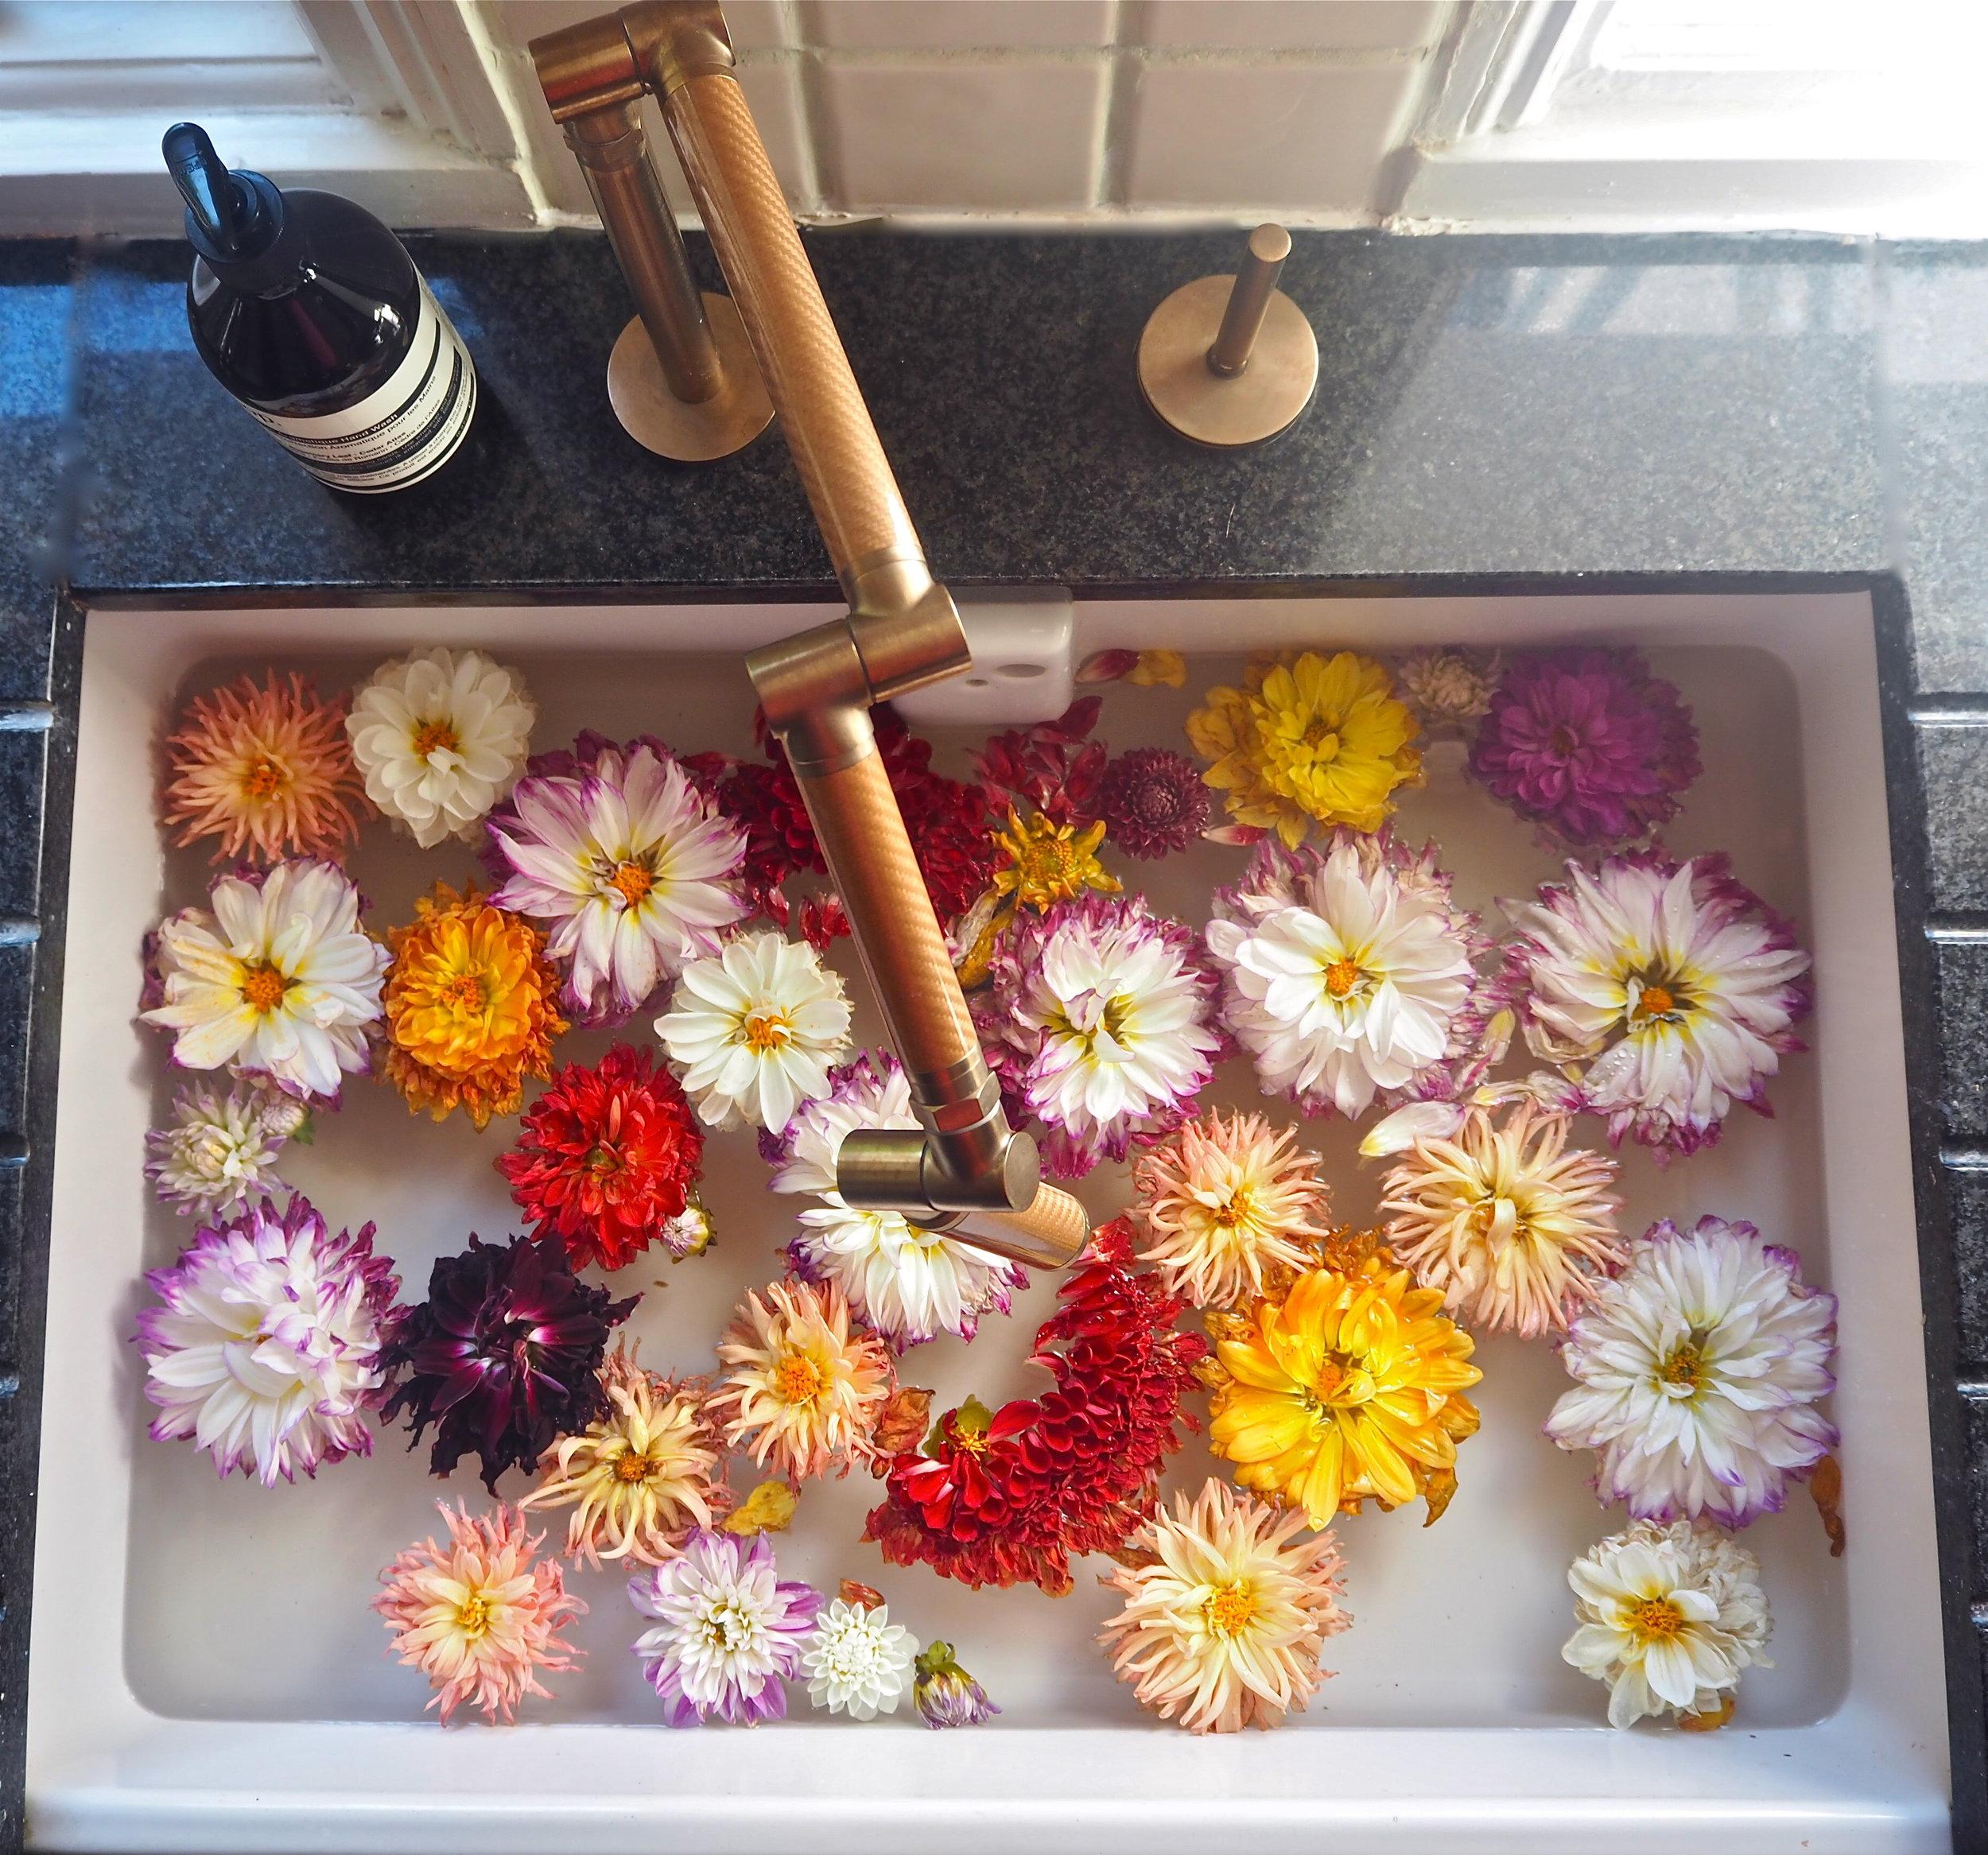 kohler karbon kitchen tap